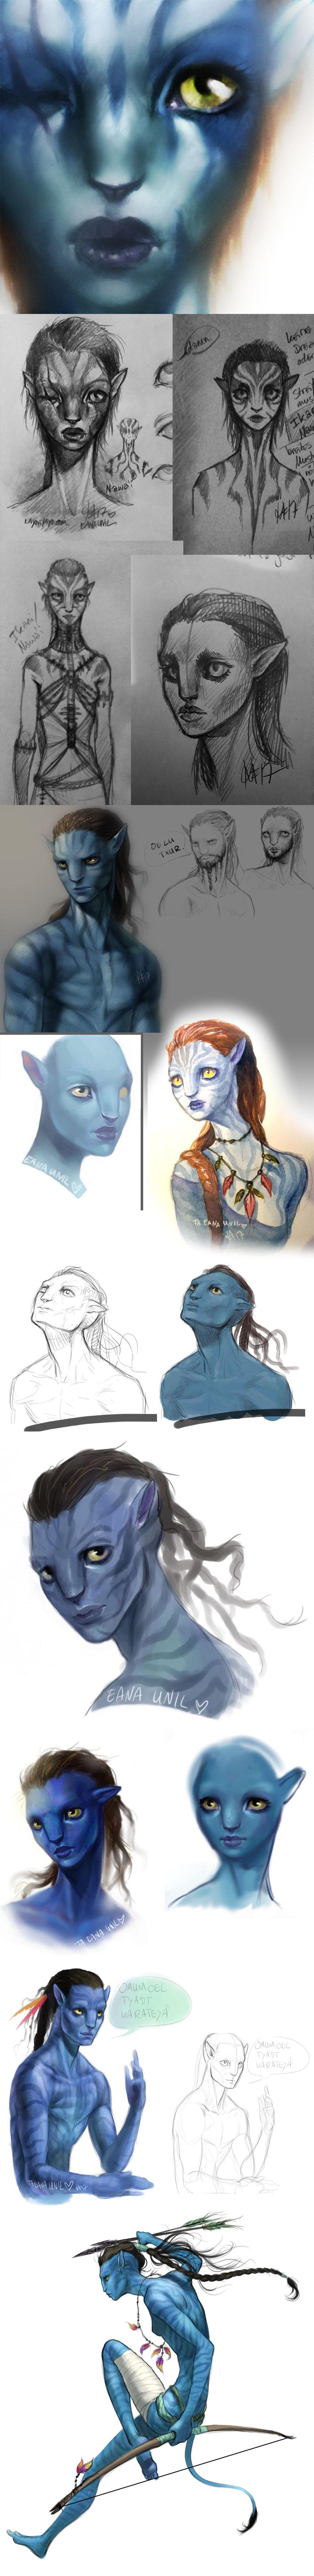 Na'vi Sketch Dump by sickdelusion